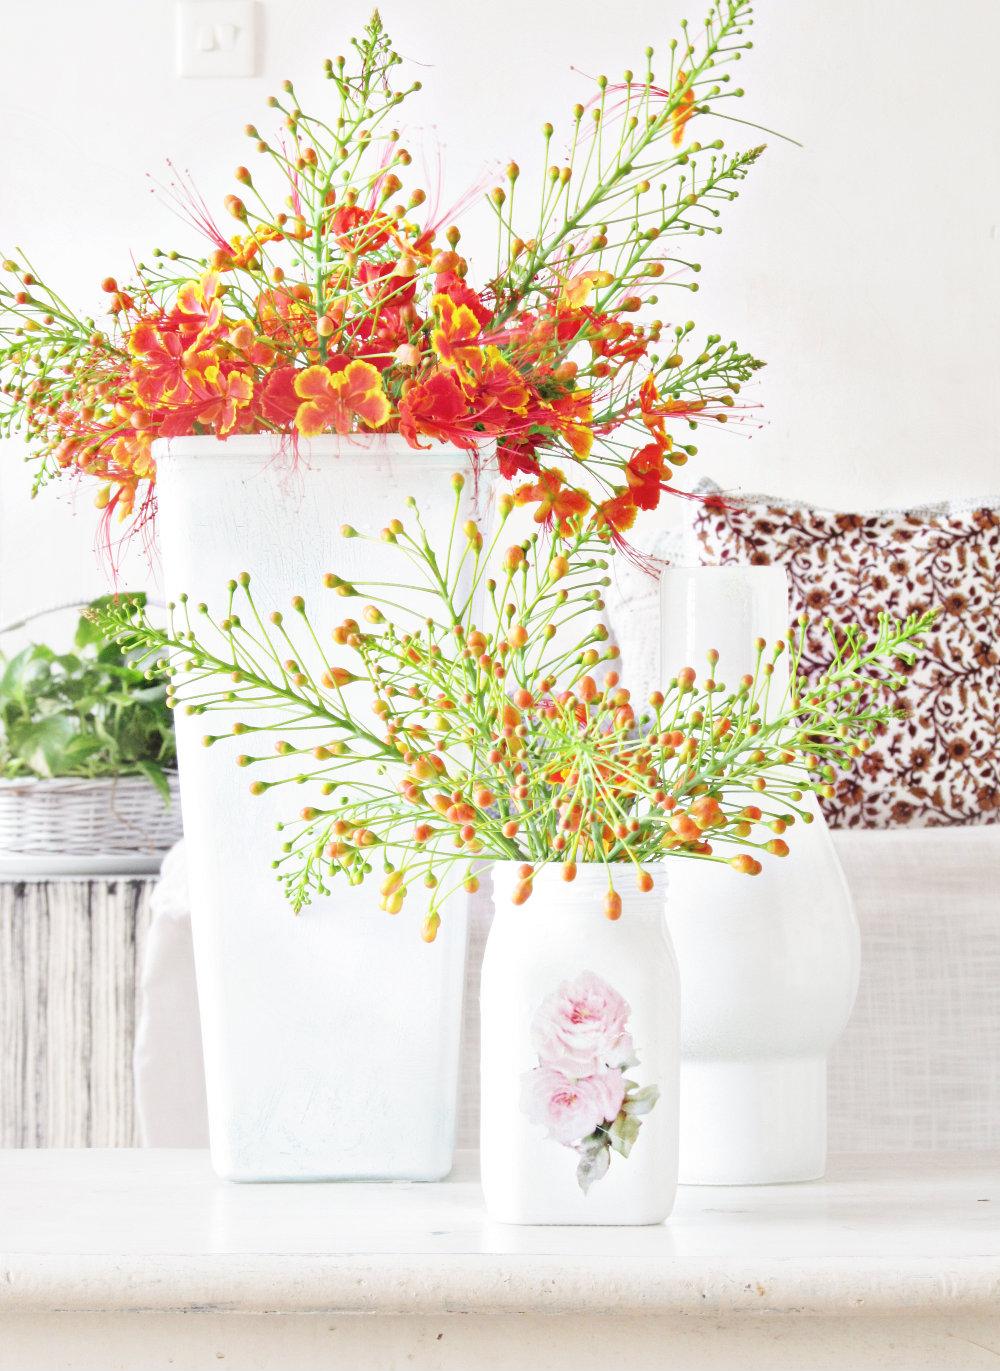 Honey Jar Flower Vase Diy And Other Broomstick Things